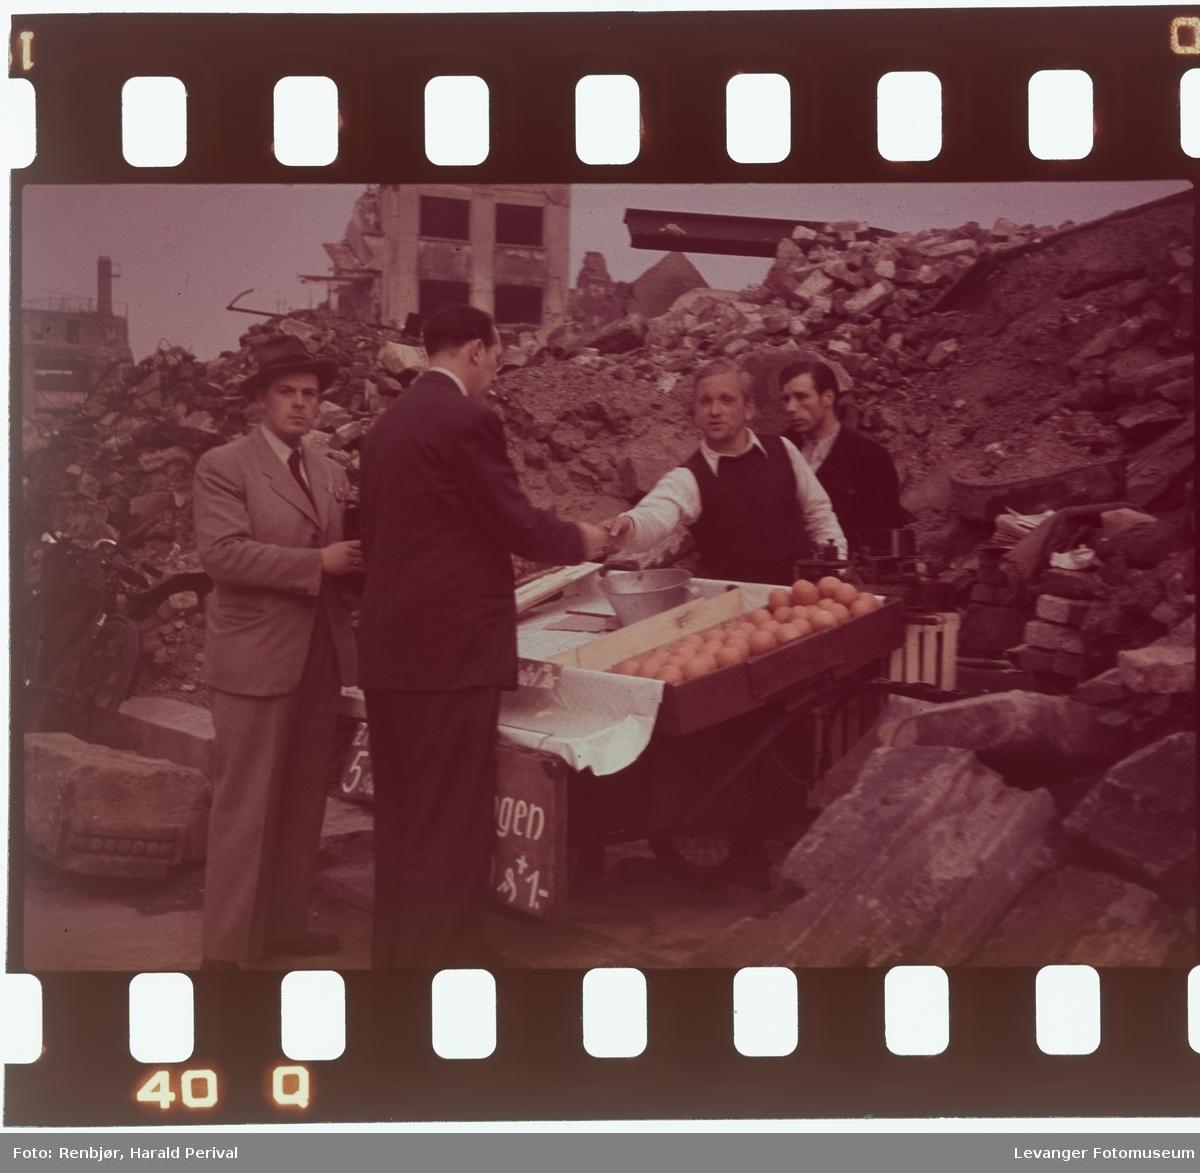 Fra Tyskland i forbindelse med deltakingen på den årlige Fotomessen i Køln. Mann selger appelsiner i ruinene.